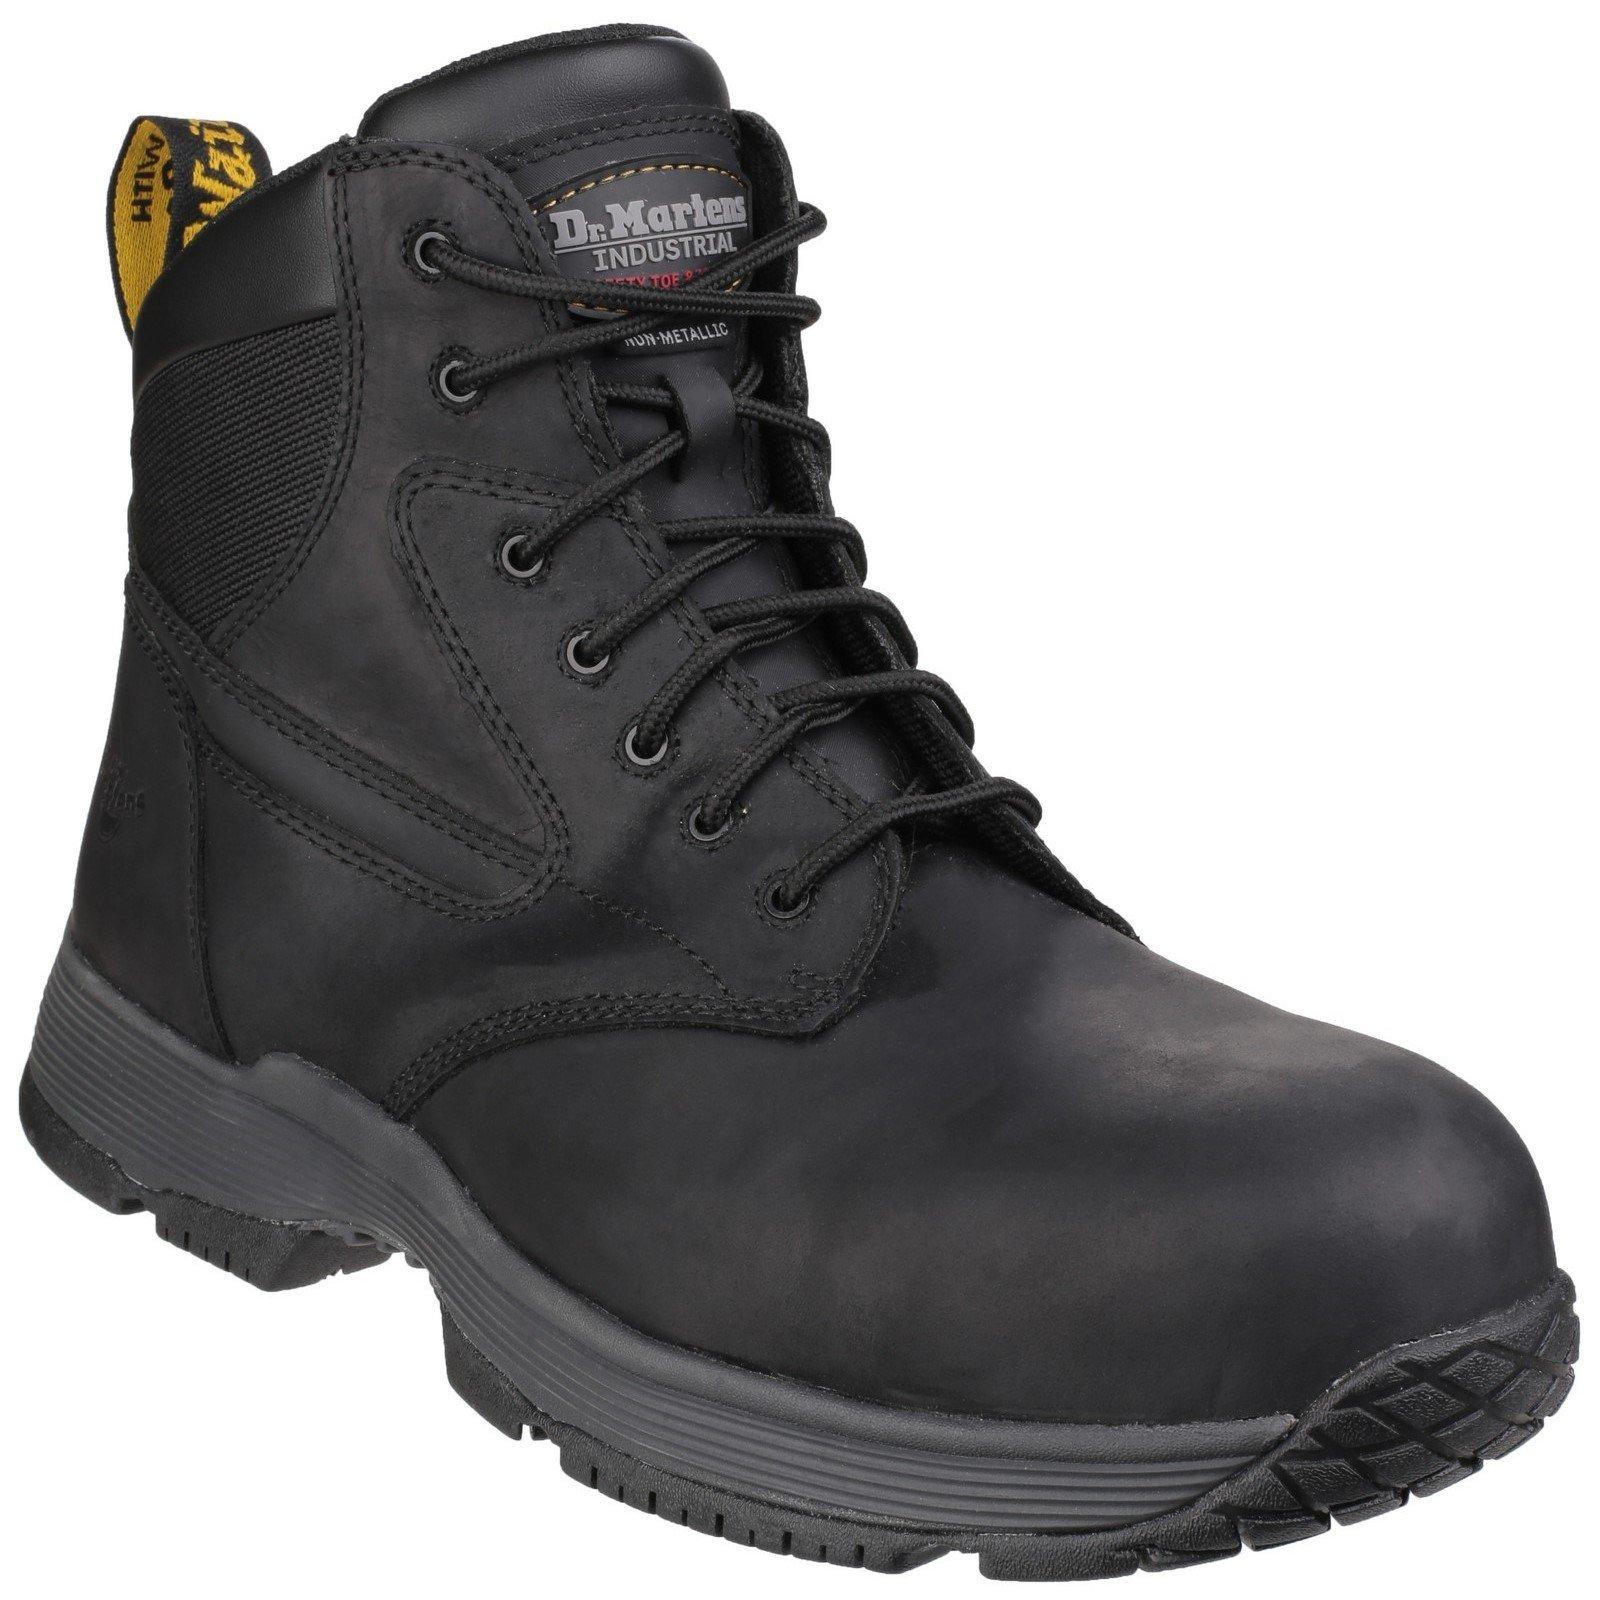 Dr Martens Unisex Corvid Composite Lace up Safety Boot Black 24862-41125 - Black 12